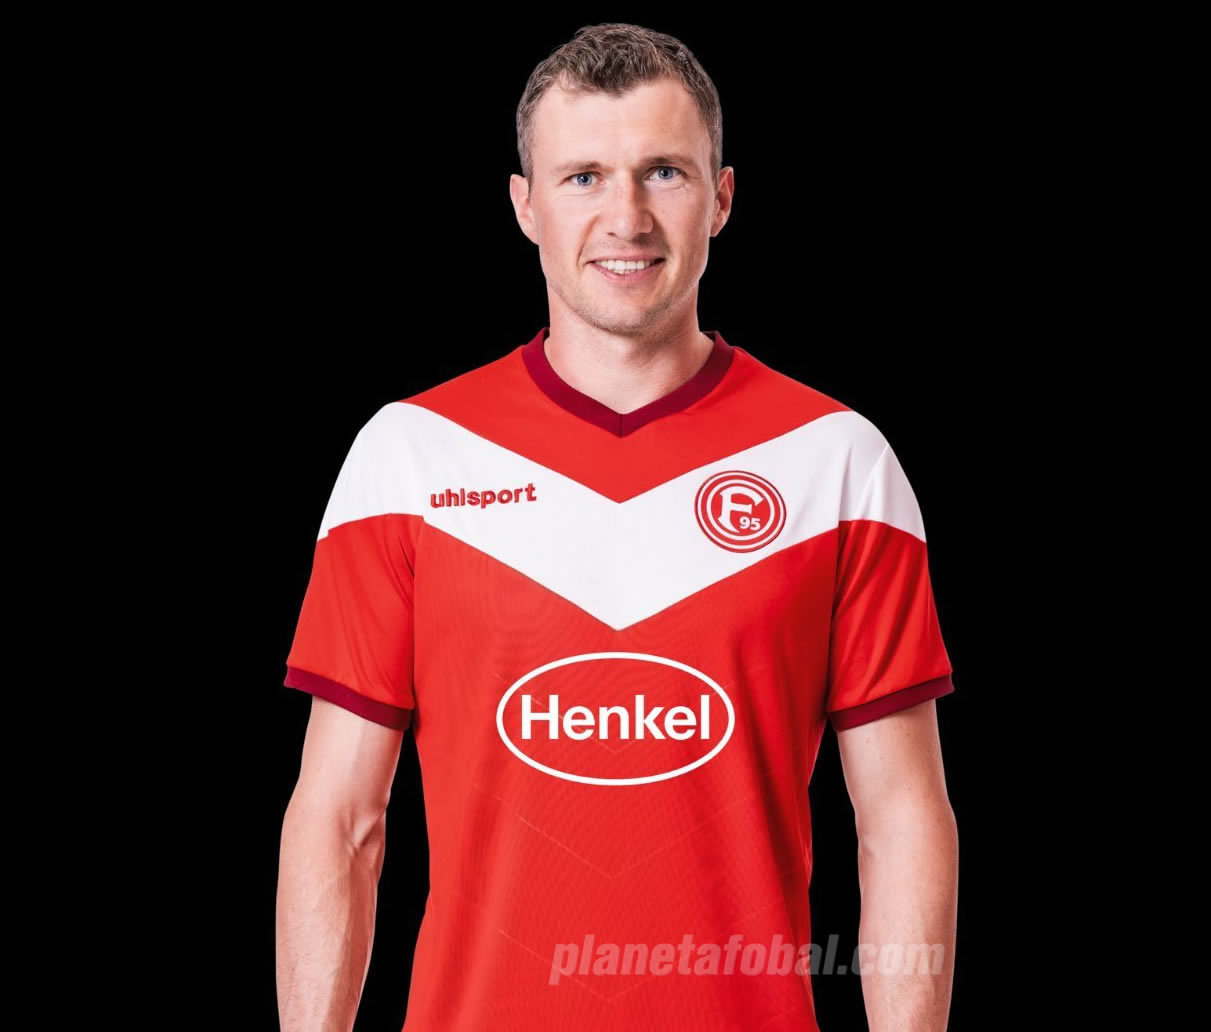 Camiseta titular Uhlsport del Fortuna Düsseldorf 2018/19 | Imagen Web Oficial